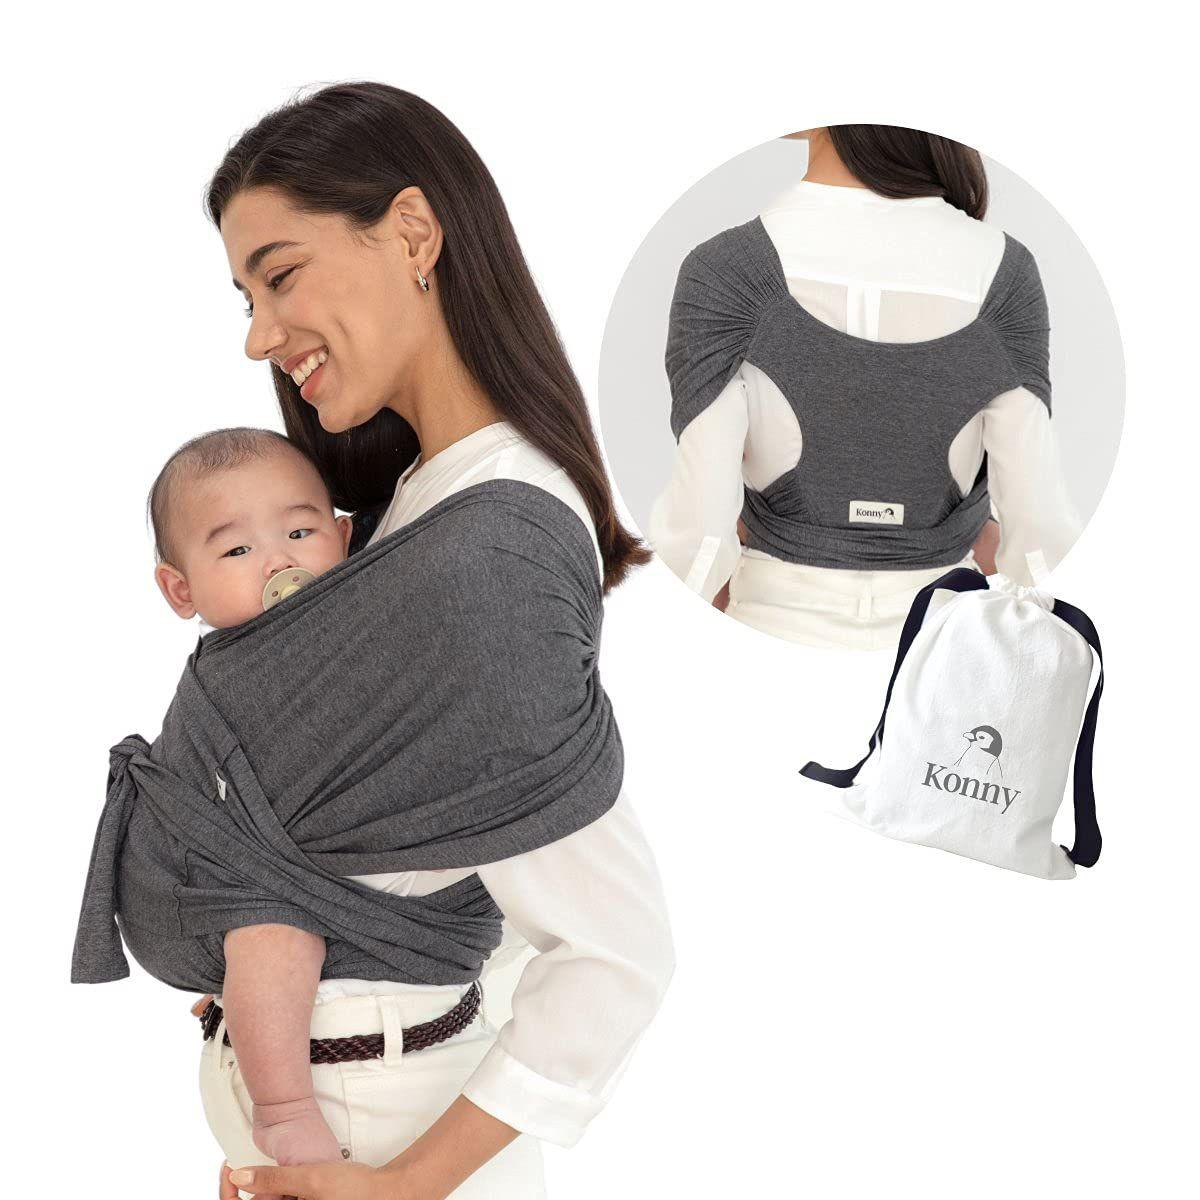 Konny Baby Carrier